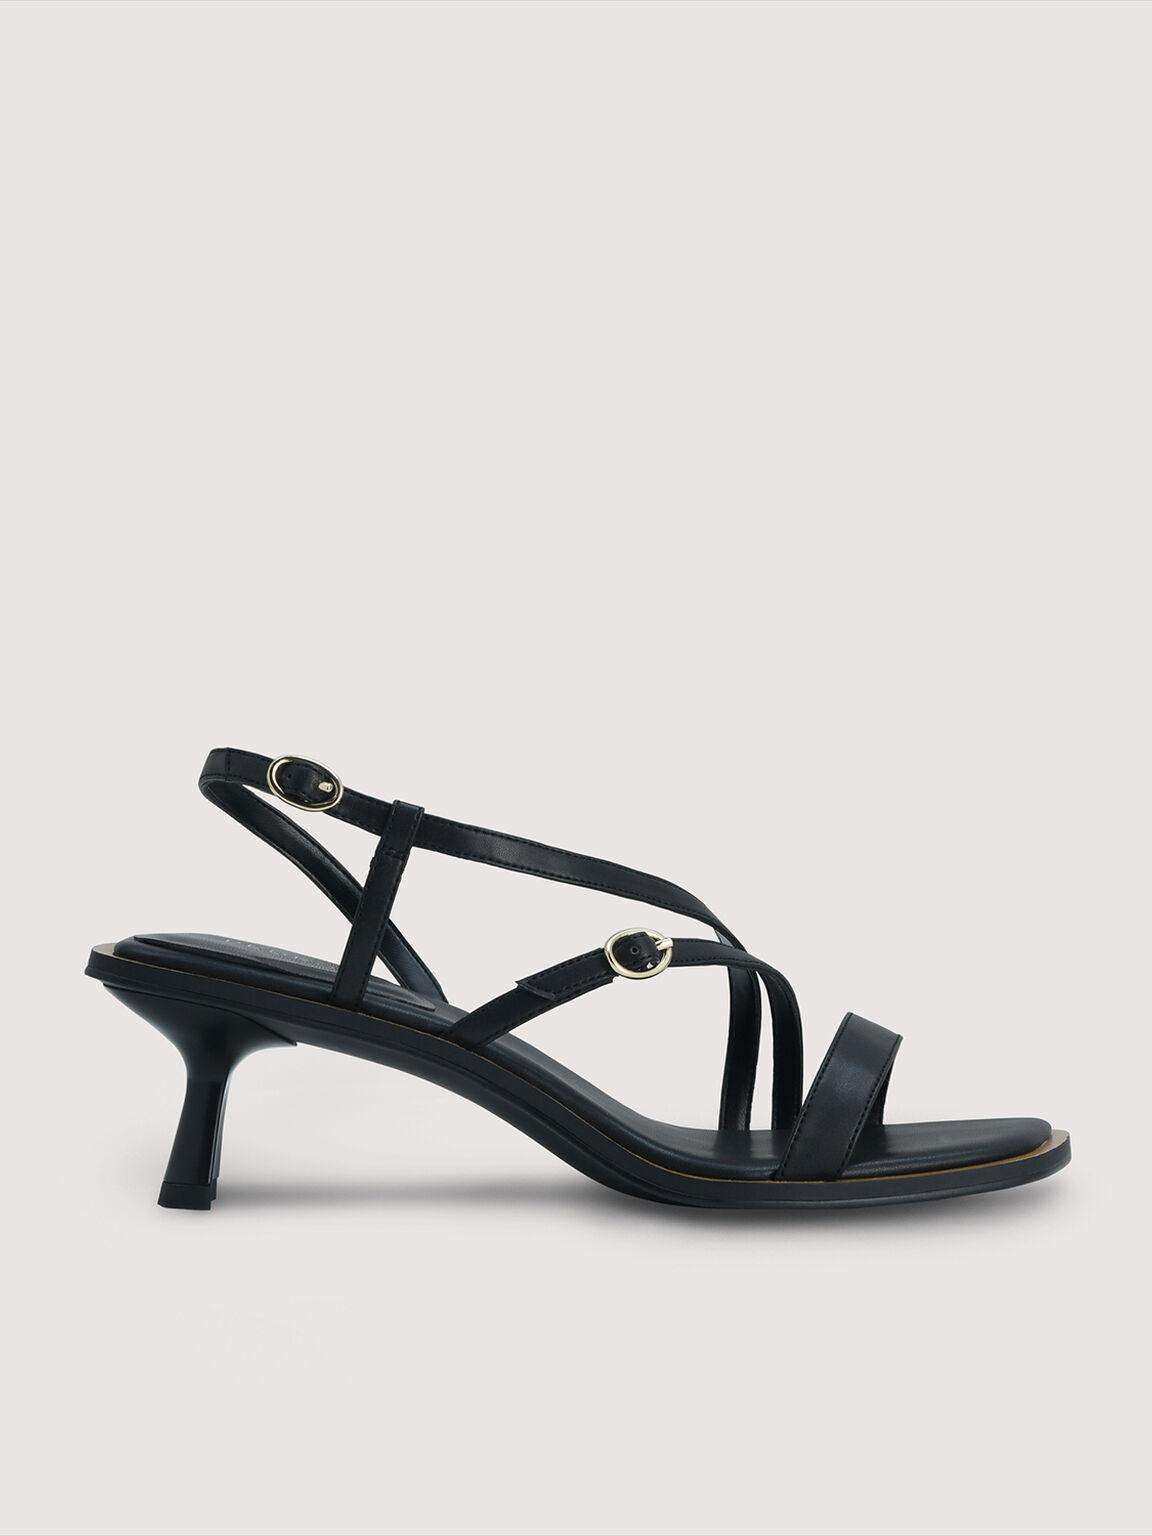 Strappy Heel Sandals, Black, hi-res